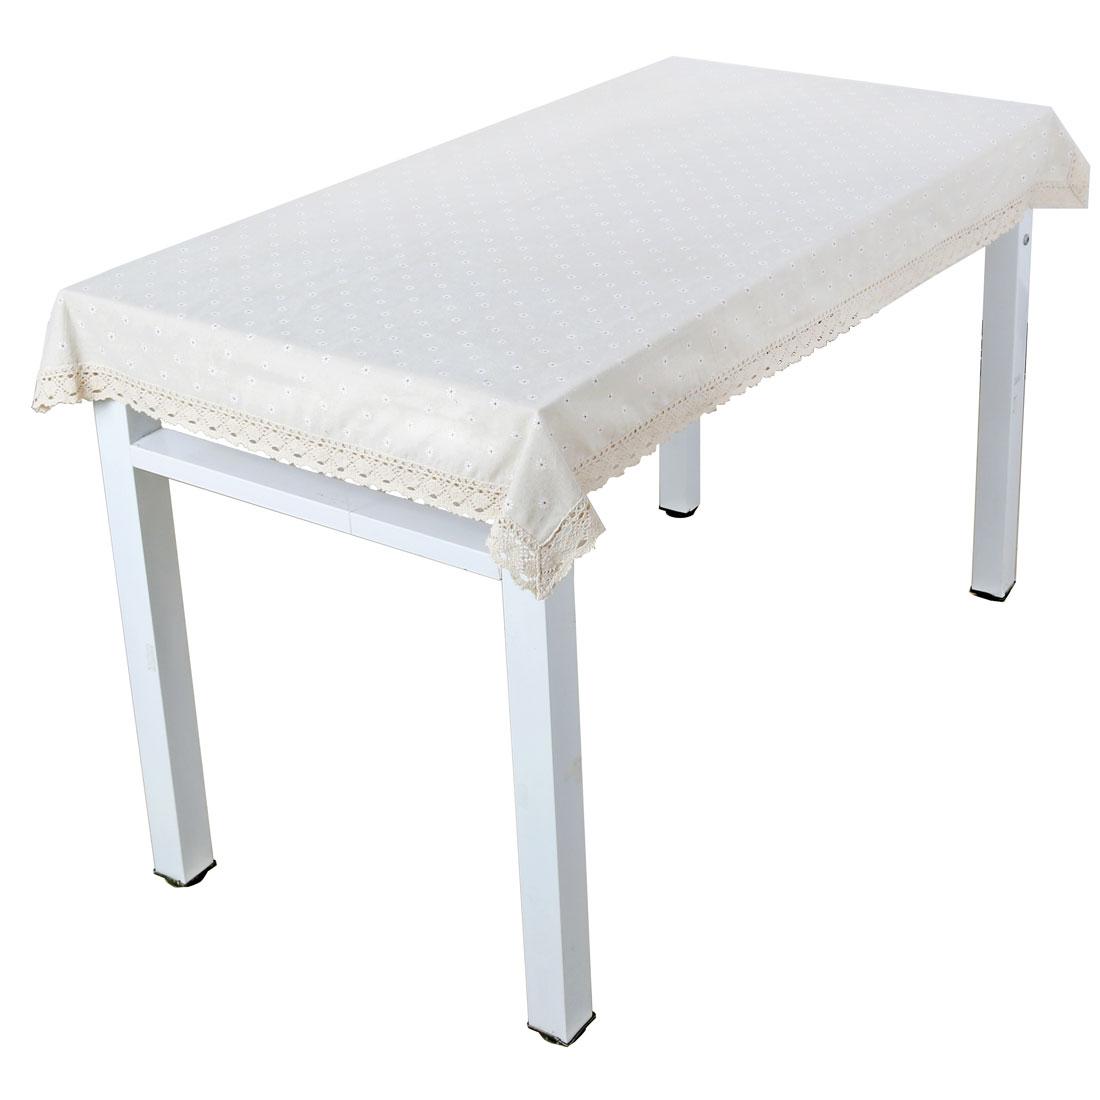 Vintage White Chrysanthemum Tablecloth Cotton Linen Washable Table Cover 140 x 140cm